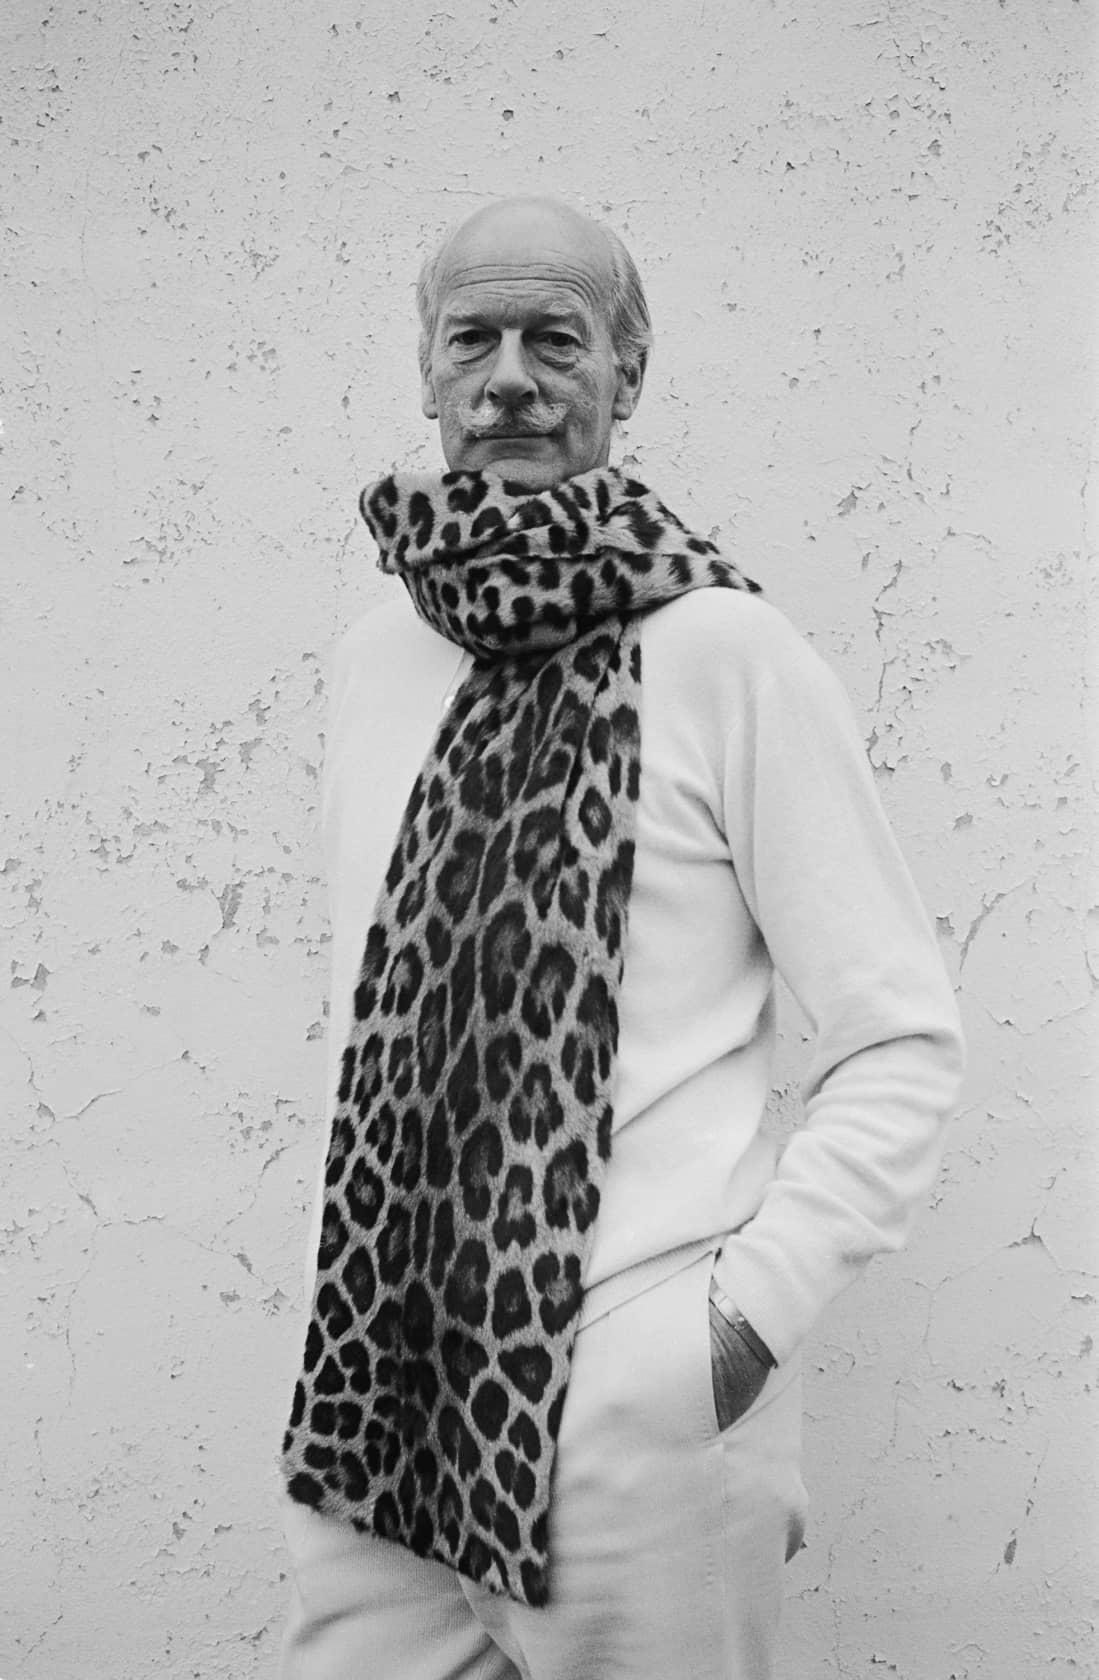 Terry O'Neill Norman Parkinson Lifetime Gelatin Silver Print